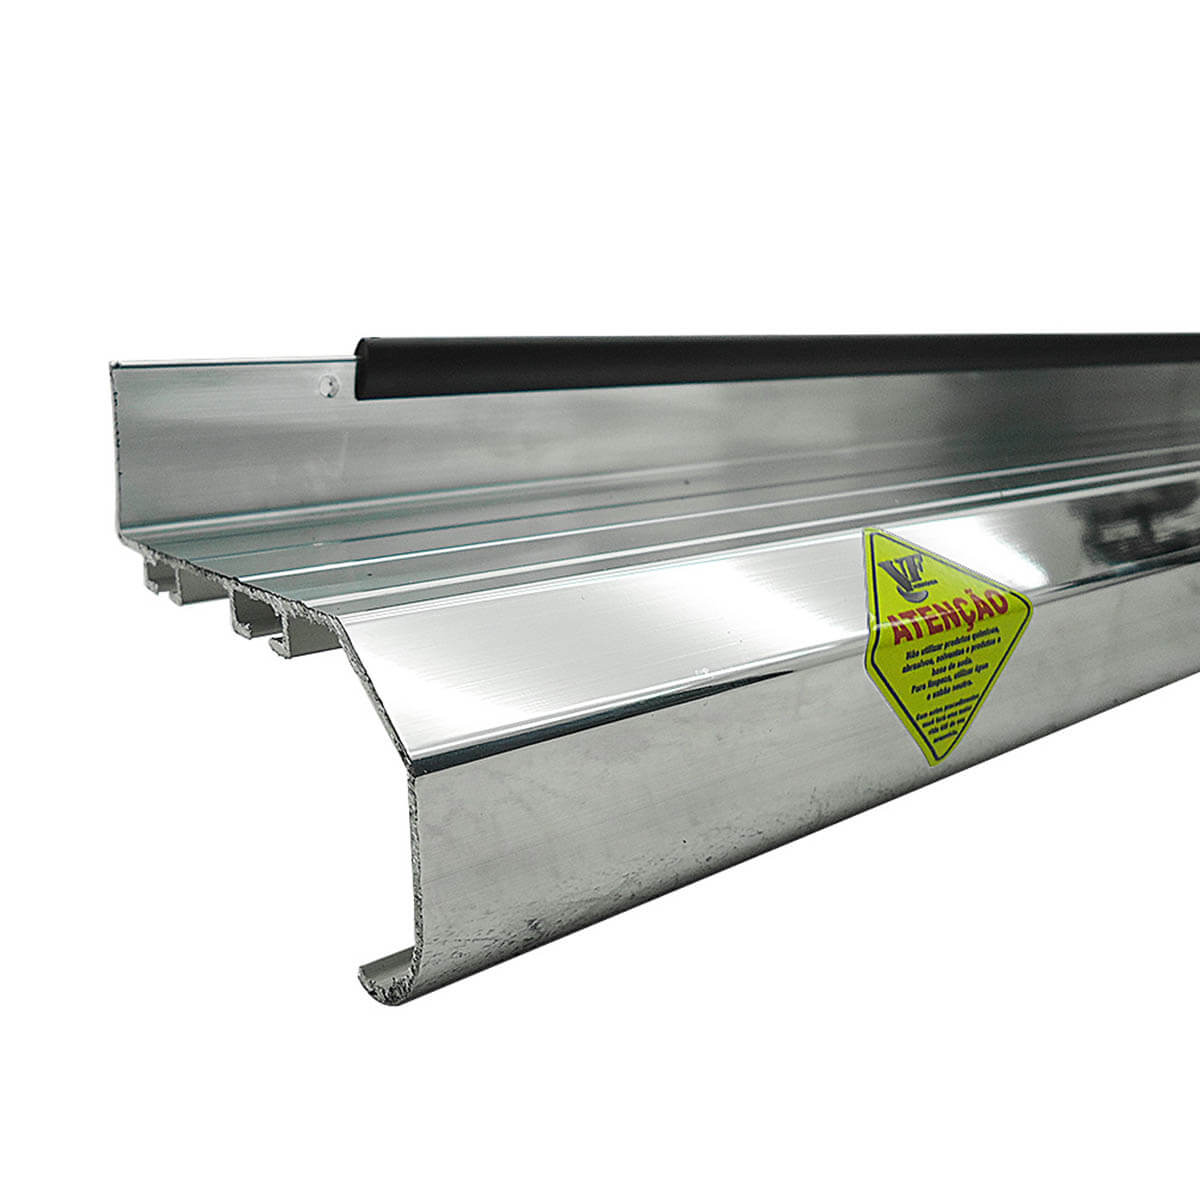 Estribo plataforma alumínio Nova S10 cabine dupla 2012 a 2018